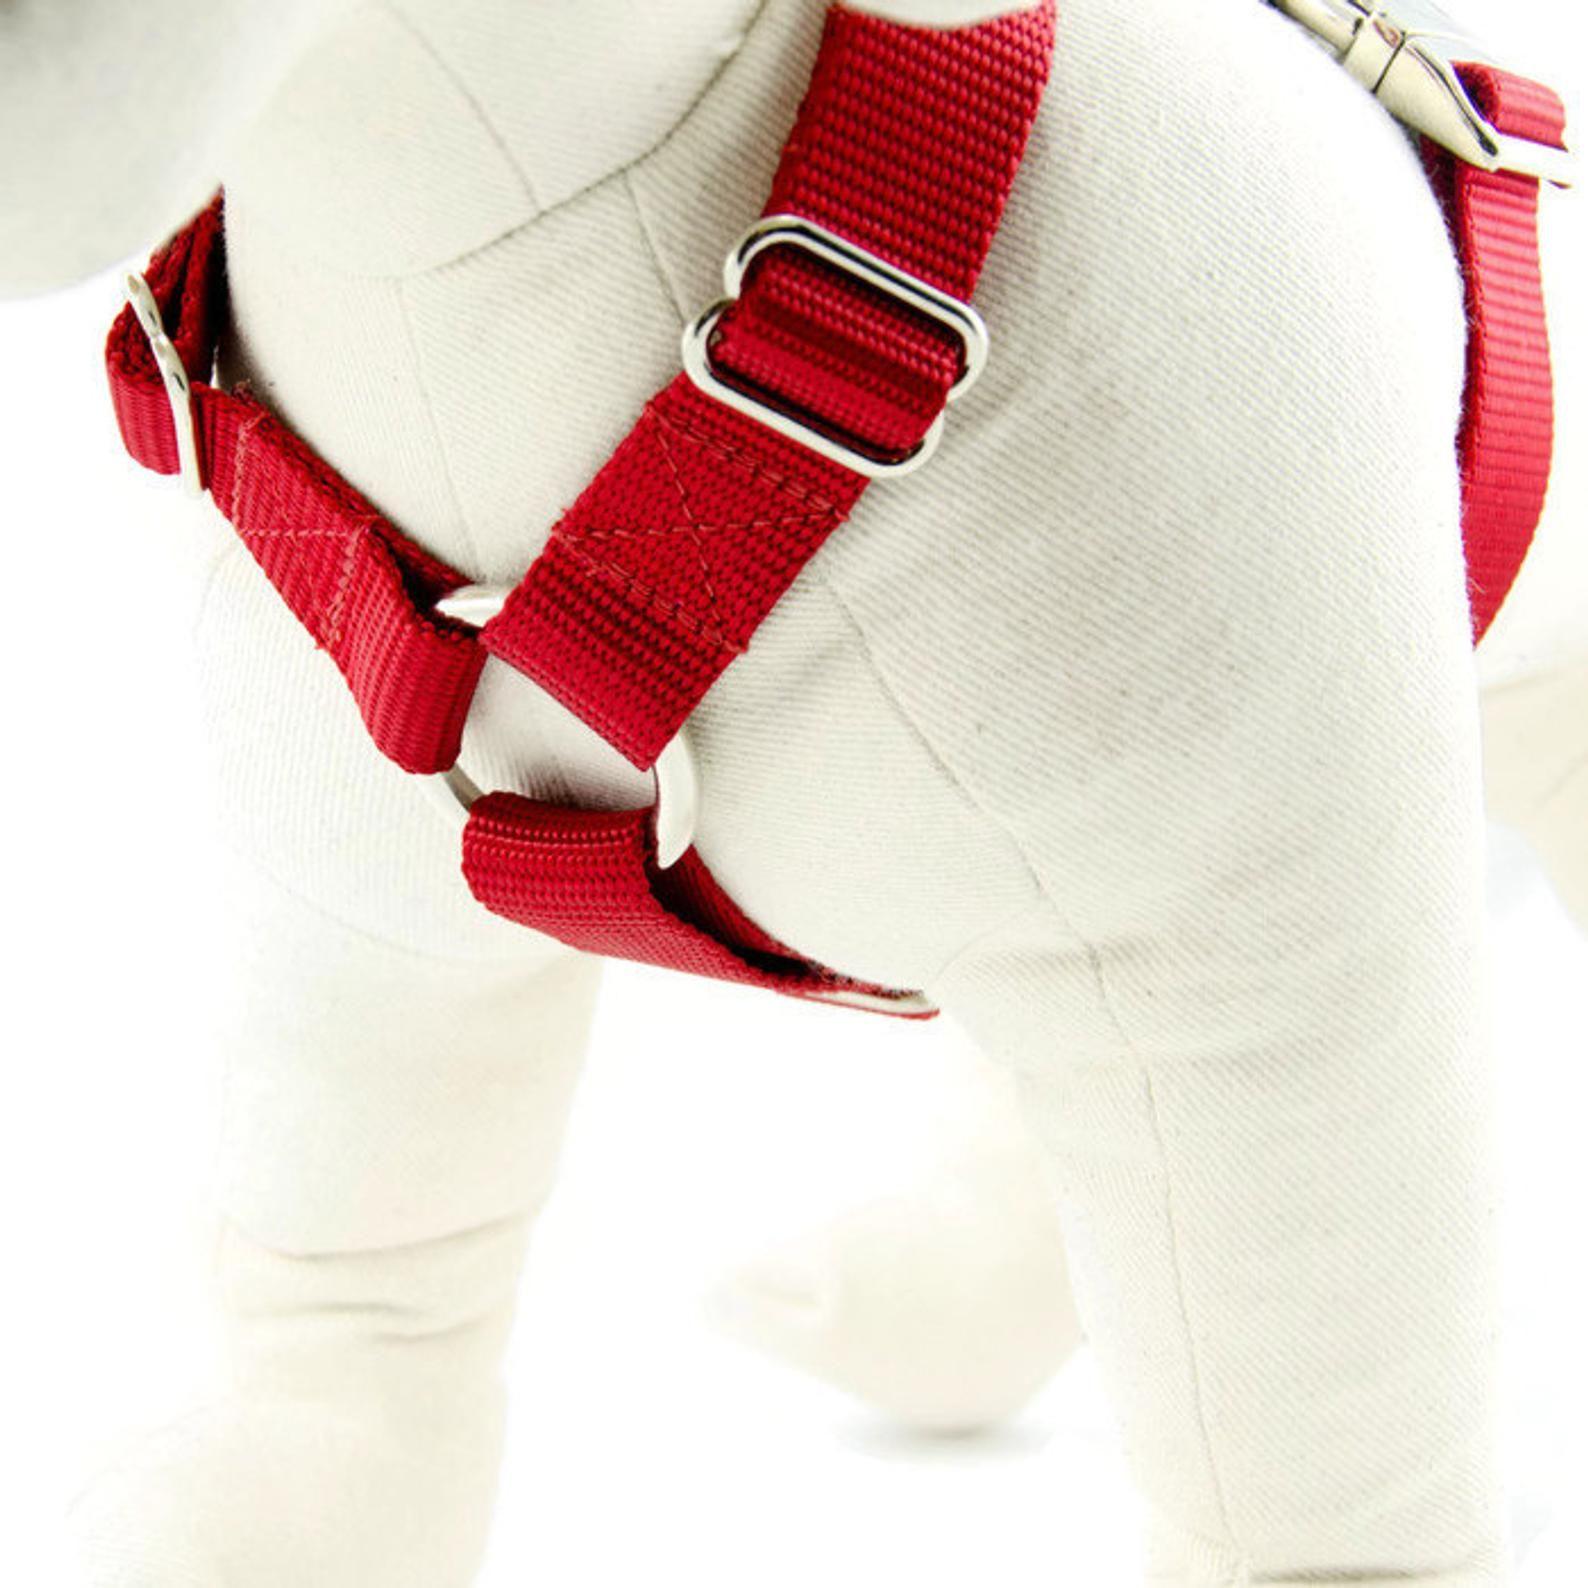 Adjustable dog harness nochoke personalized pet id tag